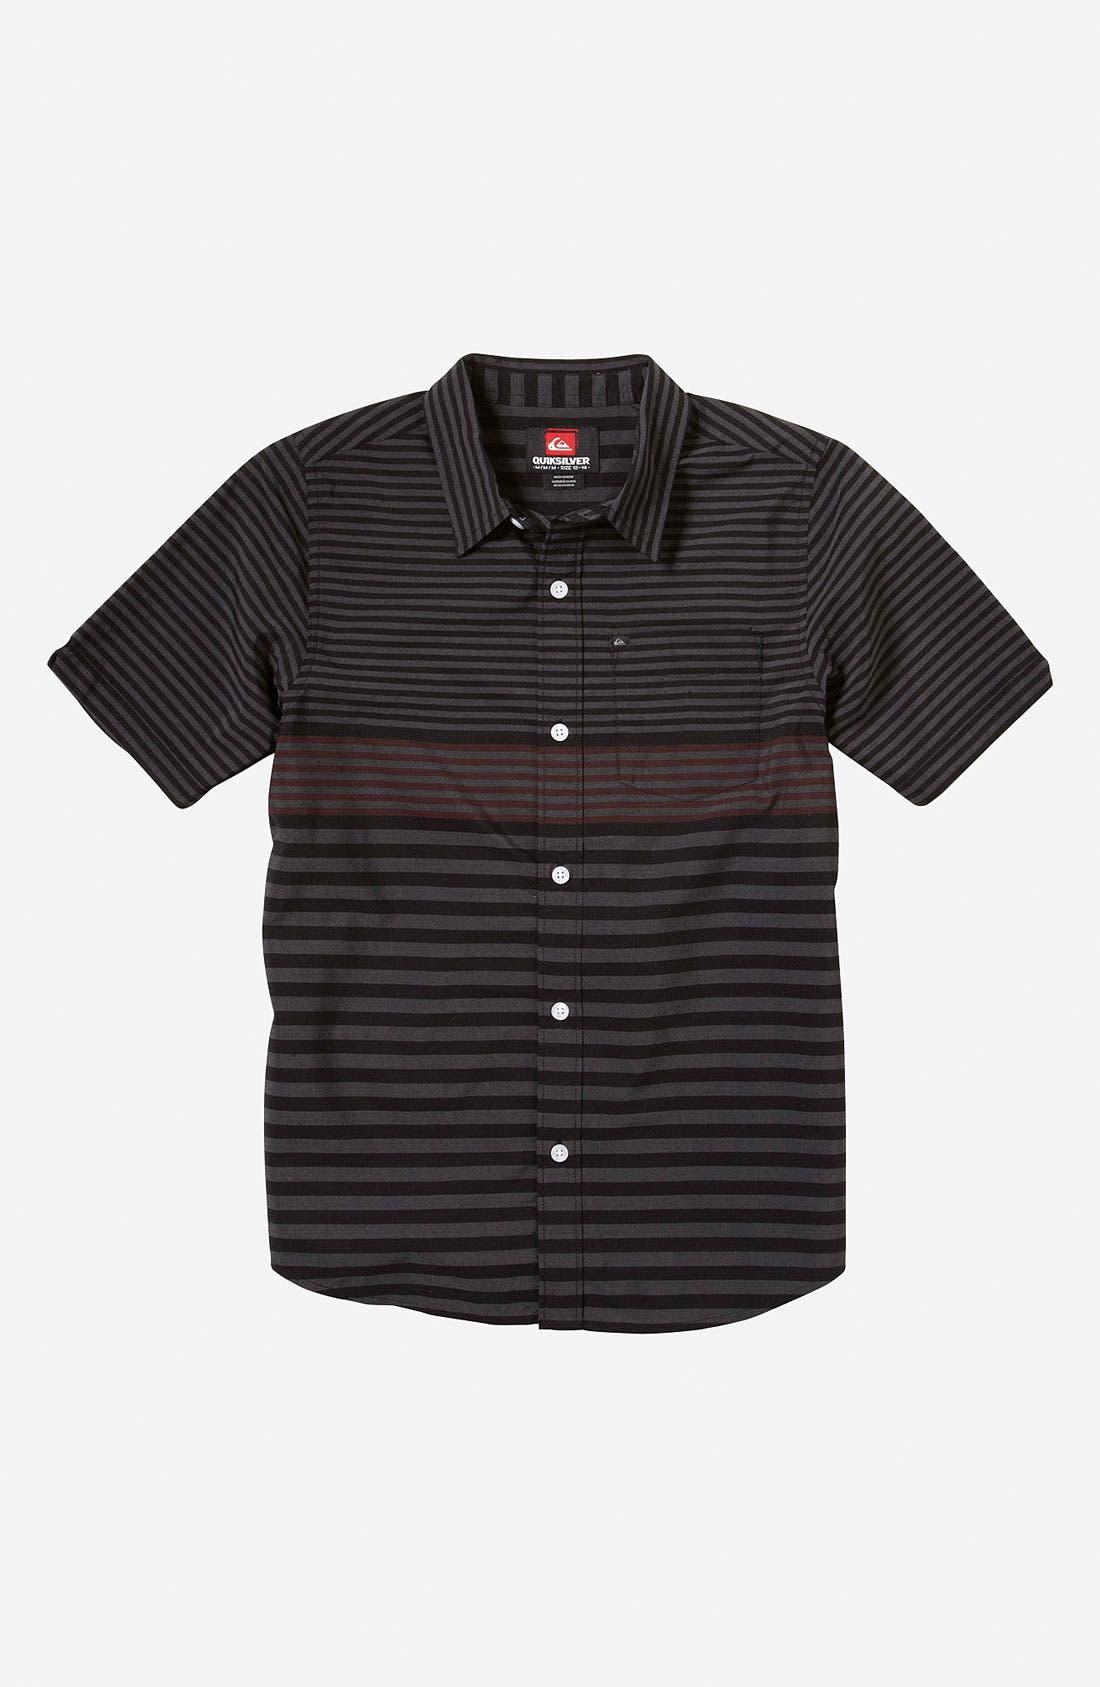 Main Image - Quiksilver 'Moving Seats' Woven Shirt (Little Boys)